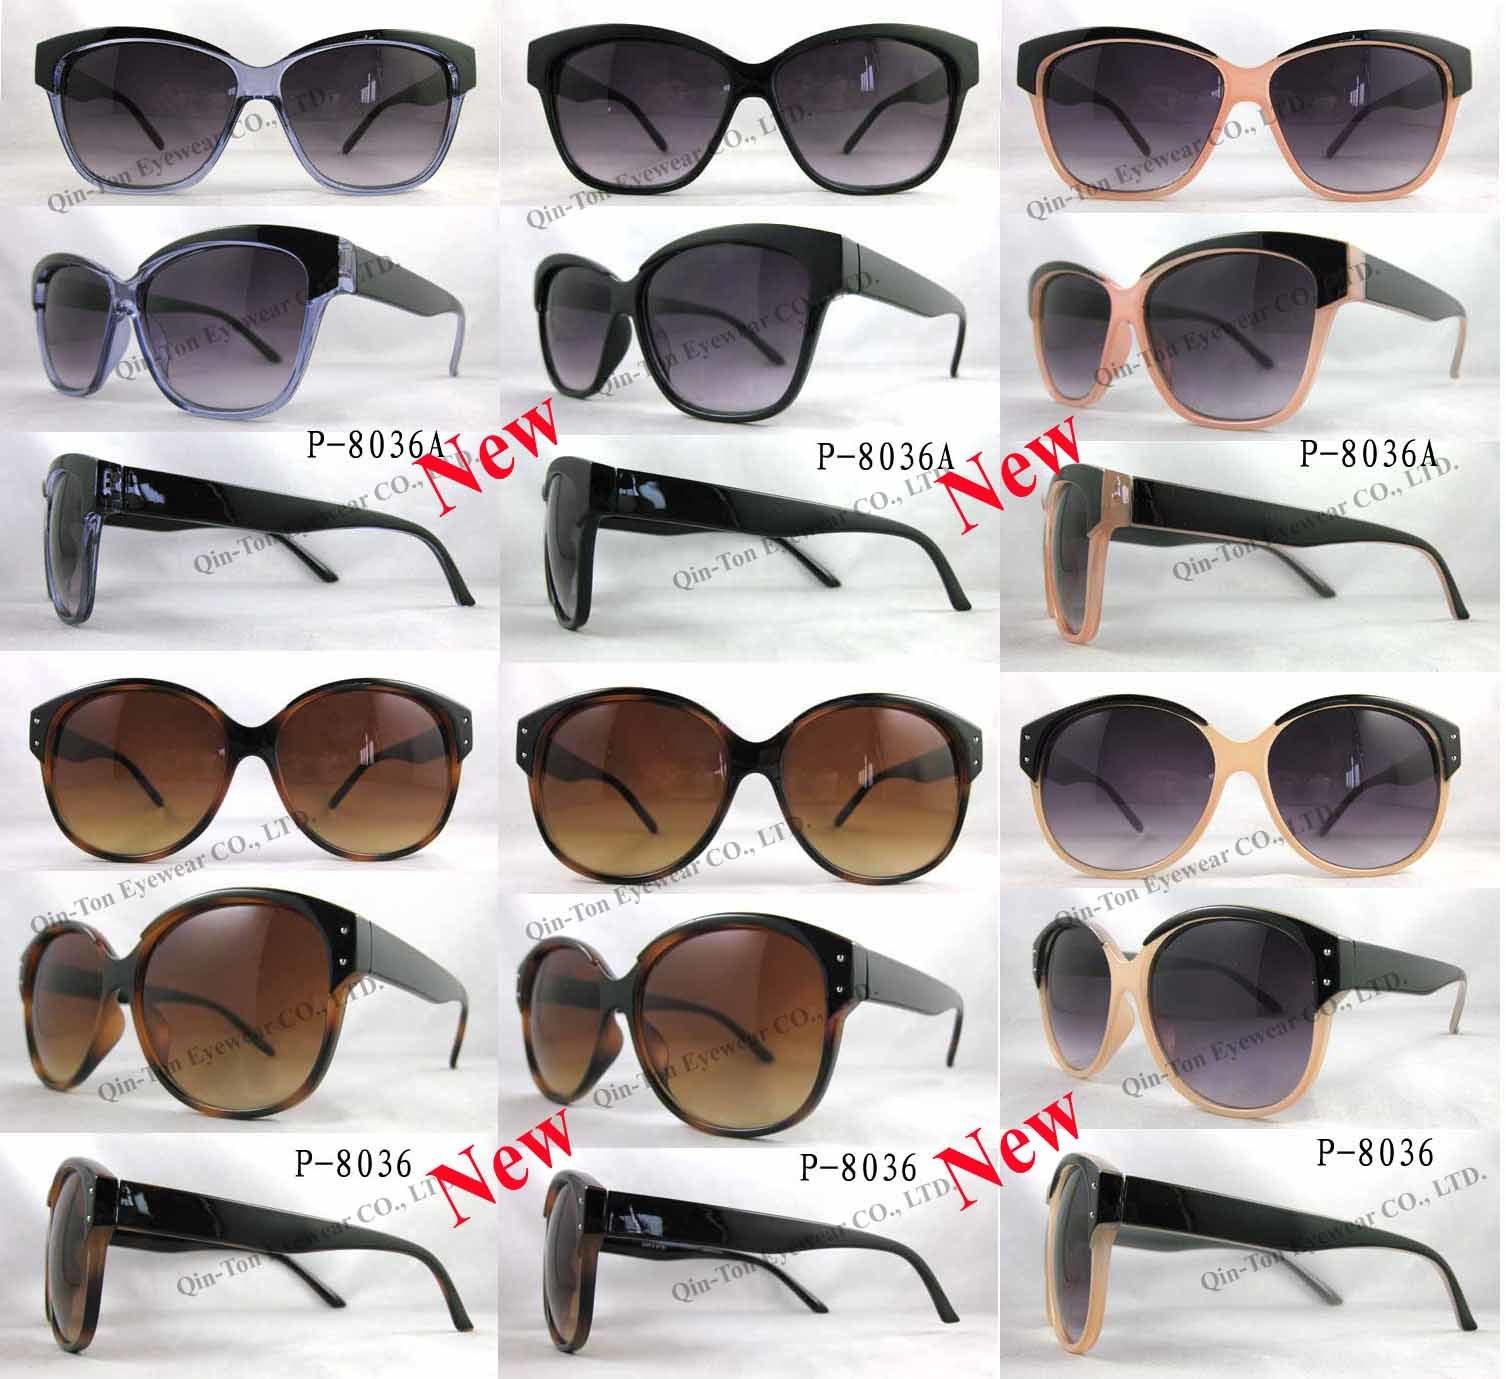 7c695974551 China Fashion and Hot Sell Sunglasses P-8036 8036A - China Sunglasses